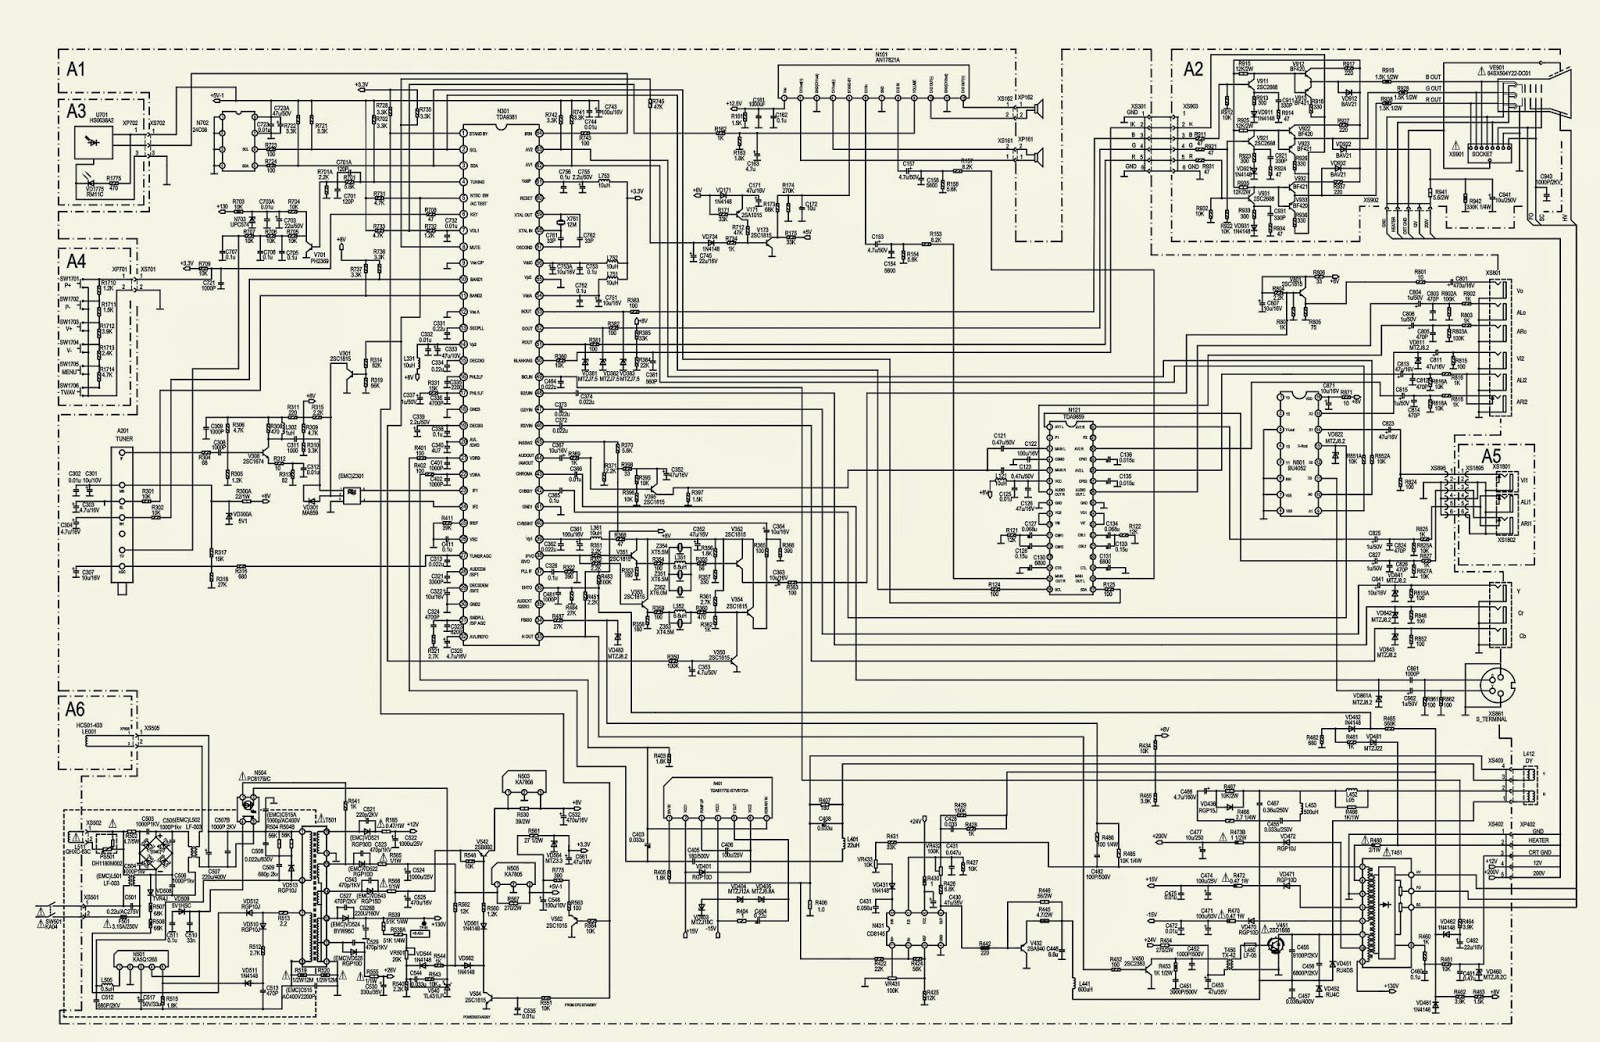 small resolution of samsung crt tv circuit diagram samsung image colour tv circuit diagram the wiring diagram on samsung schematic j info